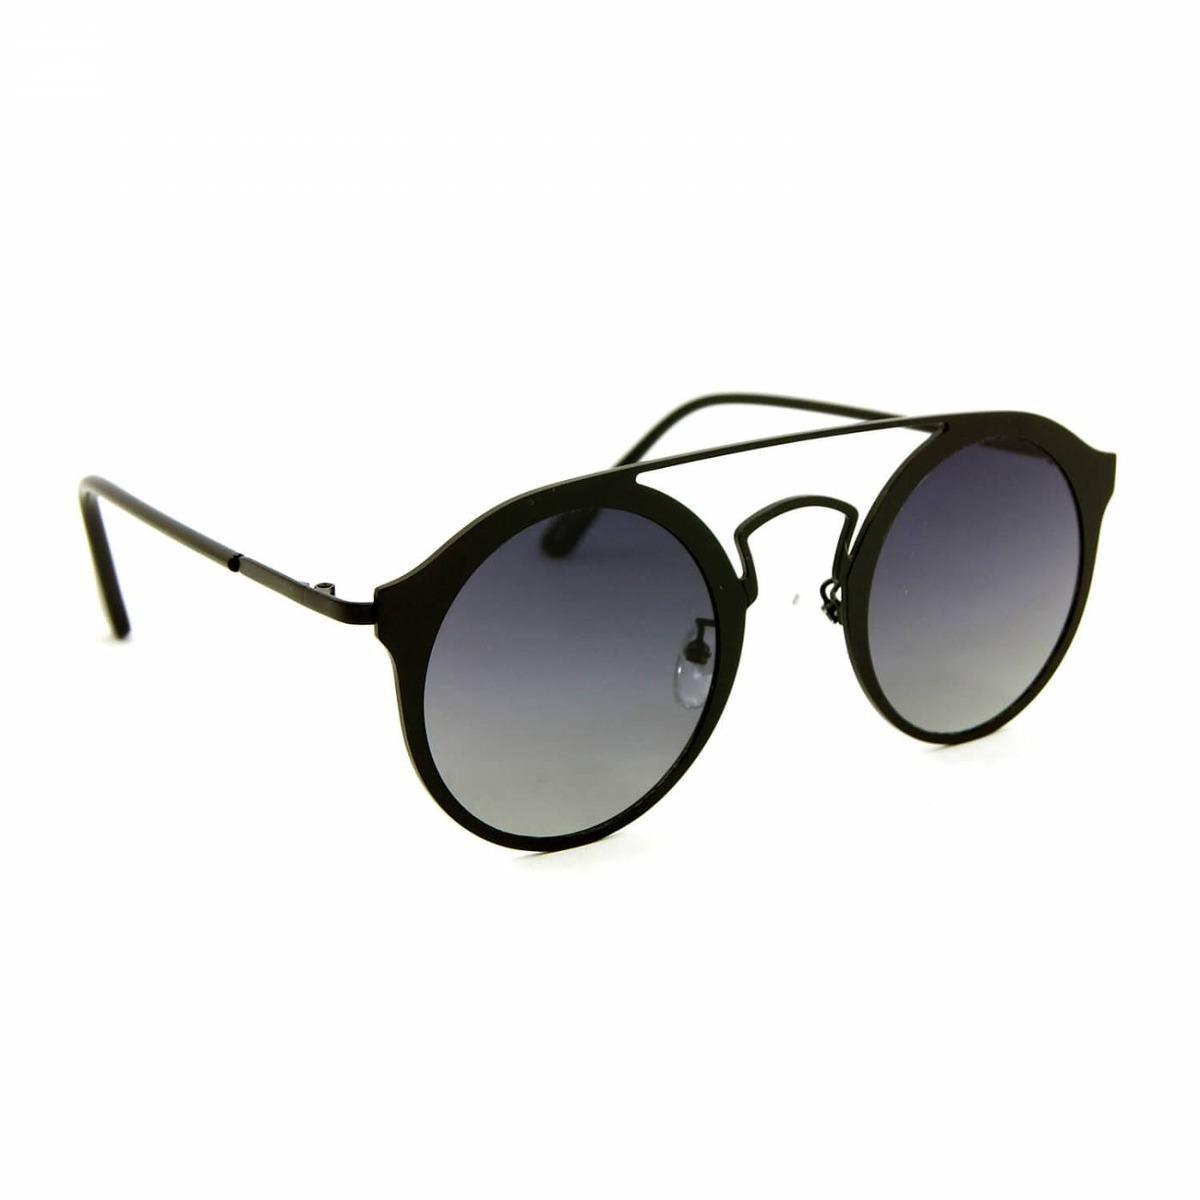 67a460fbb Óculos De Sol Estilo Top Bar Redondo Preto - R$ 106,90 em Mercado Livre